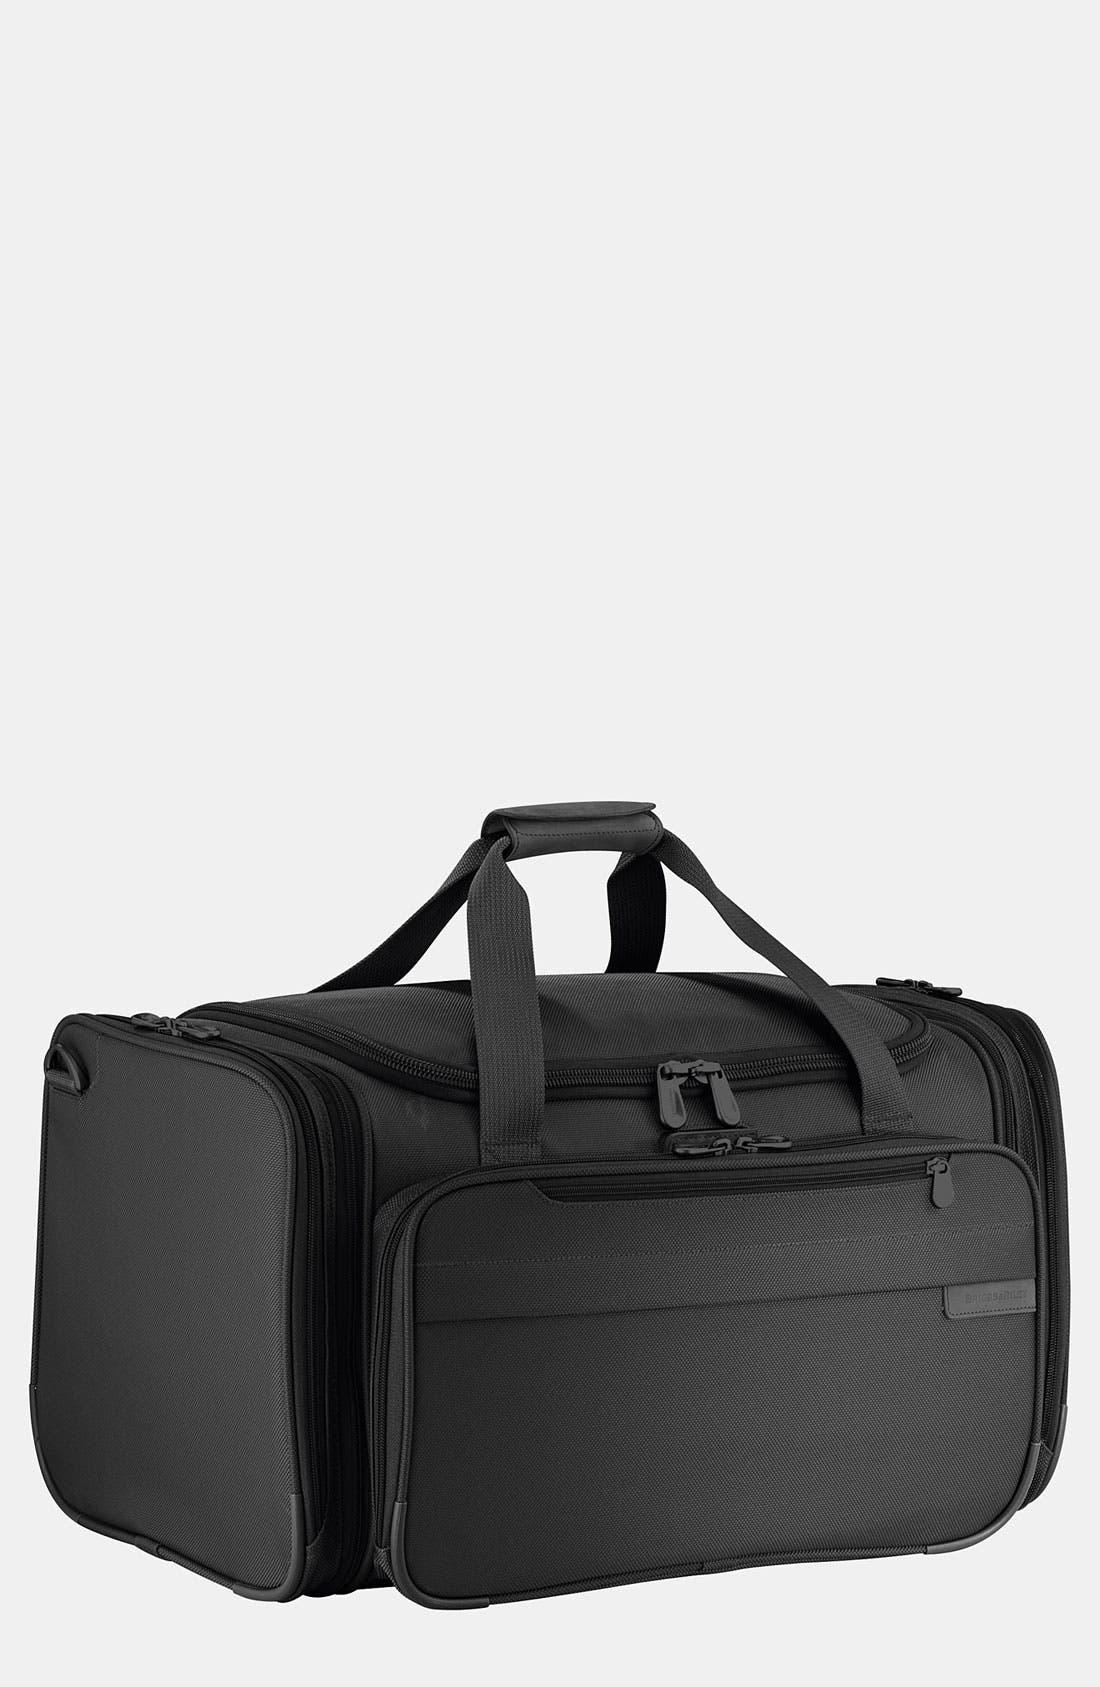 Main Image - Briggs & Riley 'Baseline' Expandable Duffel Bag